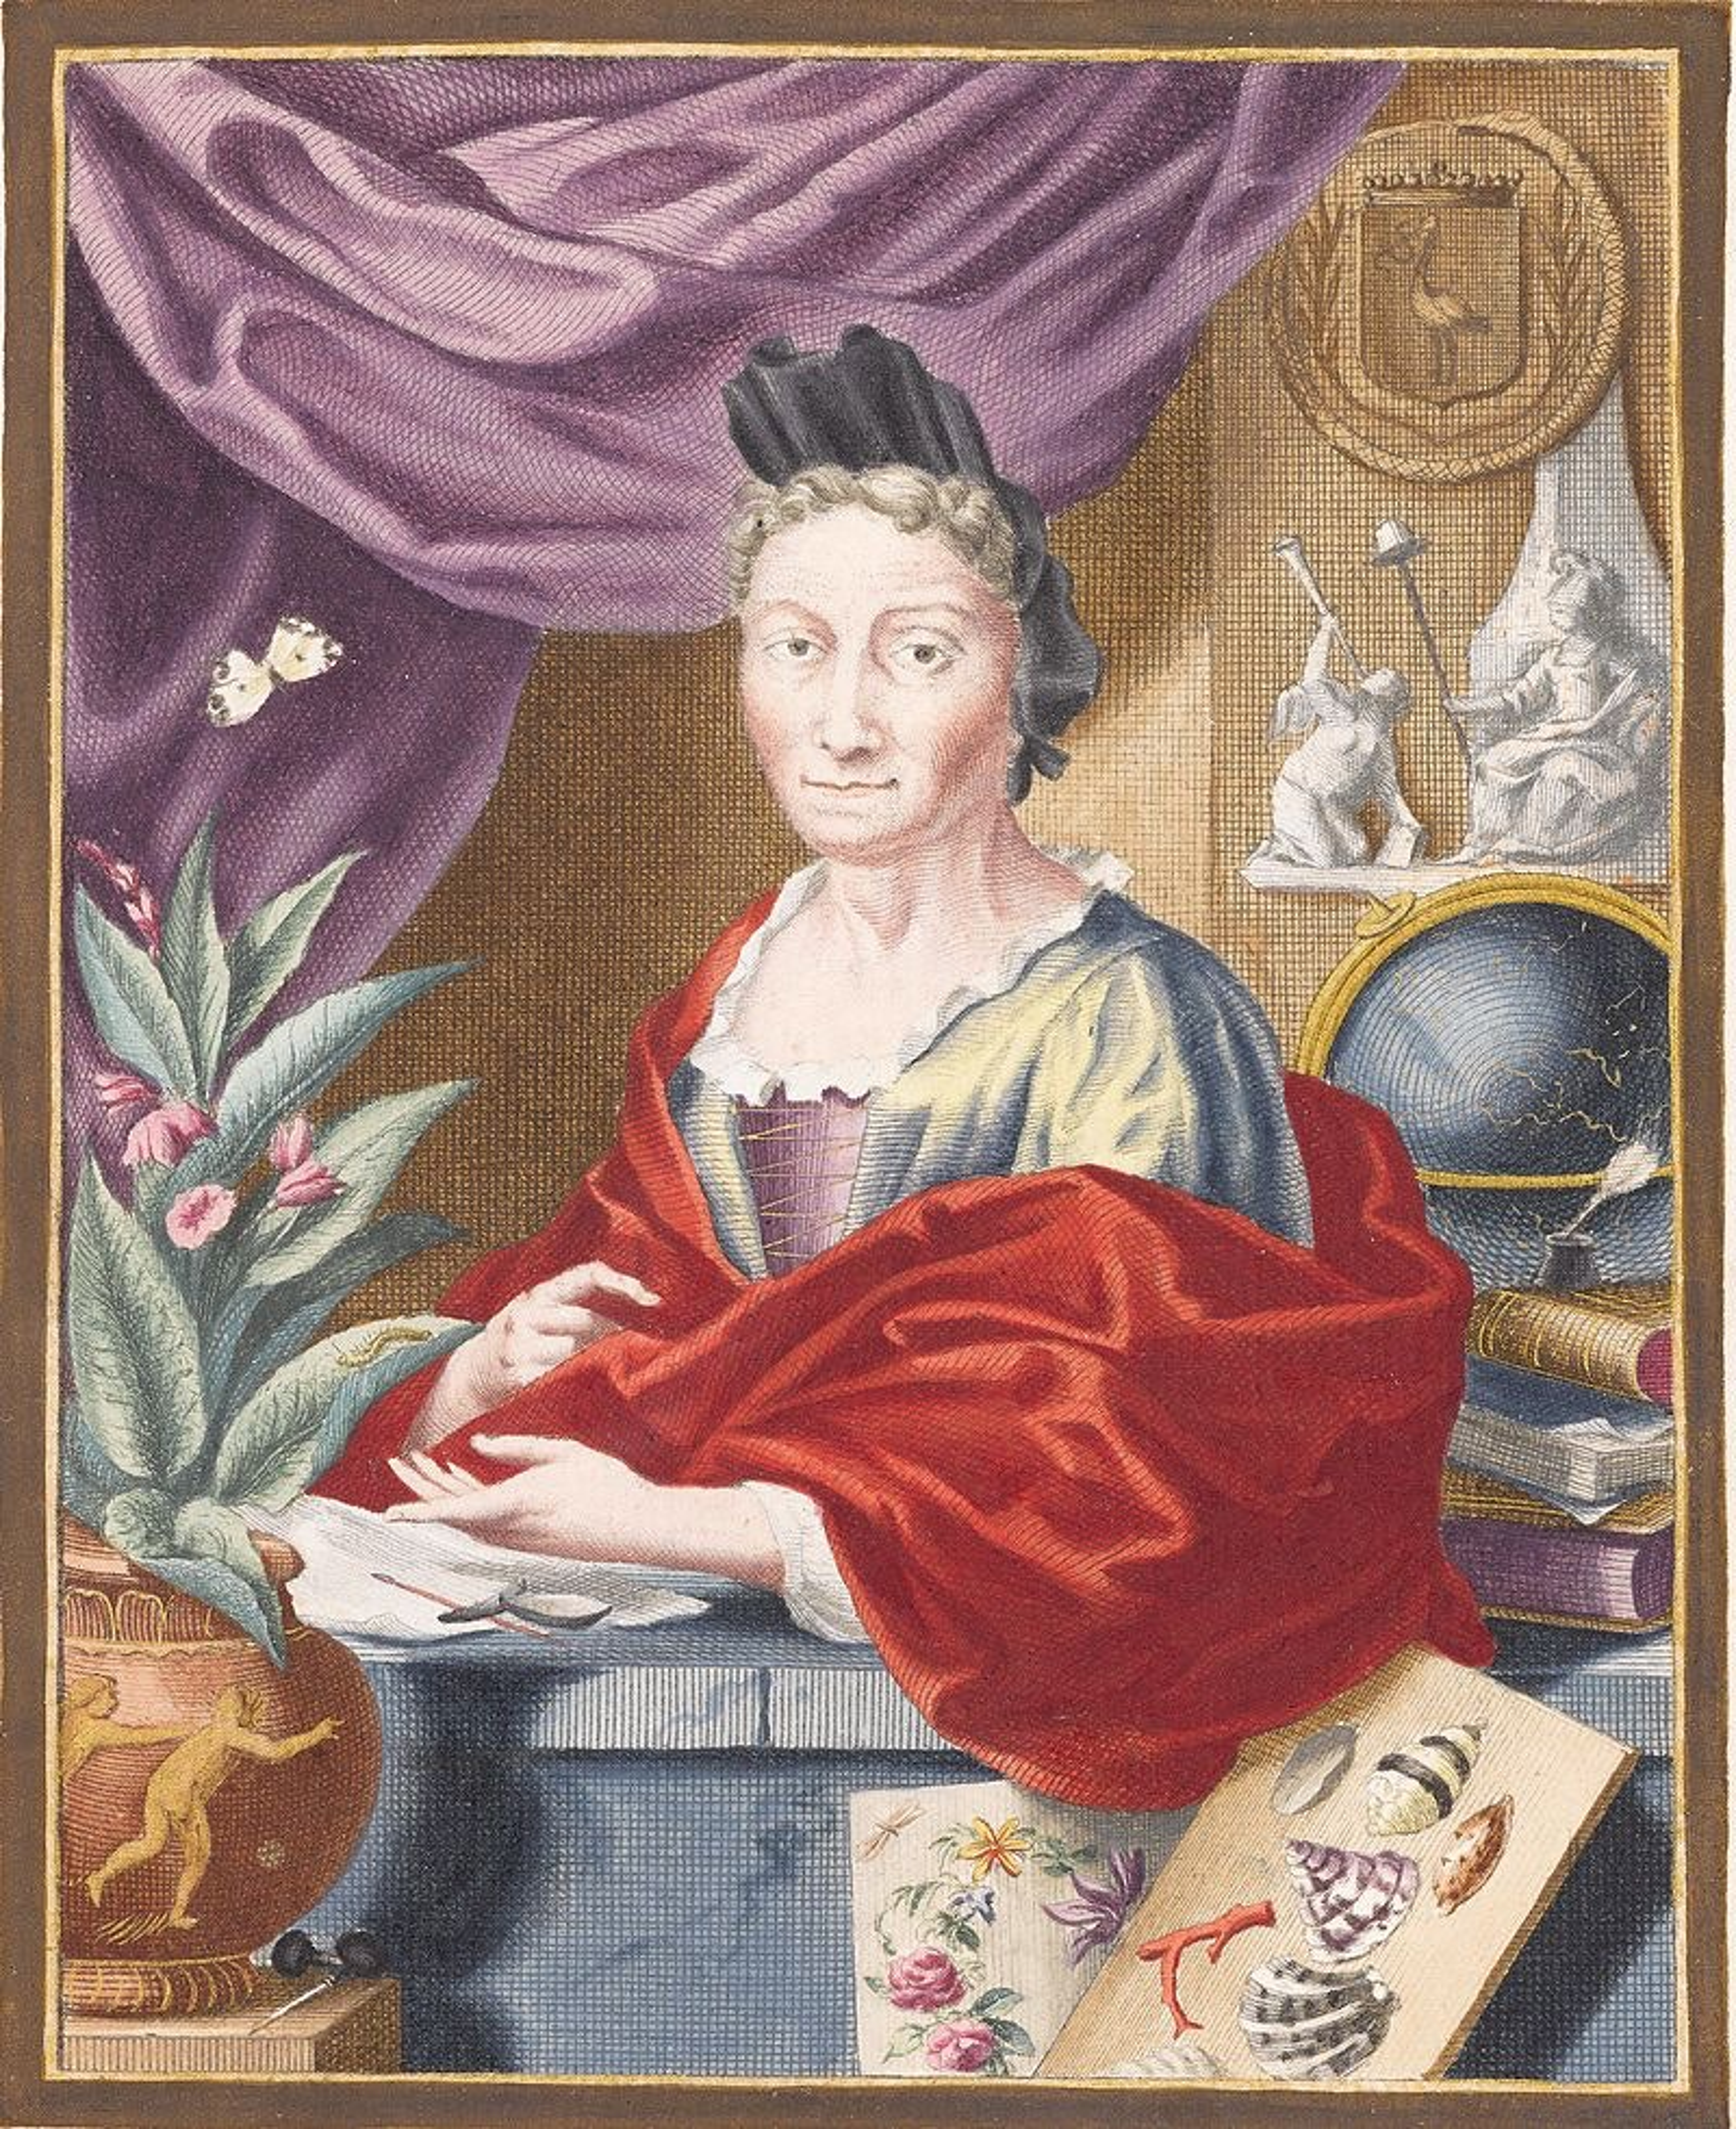 Hidden women of history: Maria Sibylla Merian, 17th-century entomologist and scientific adventurer